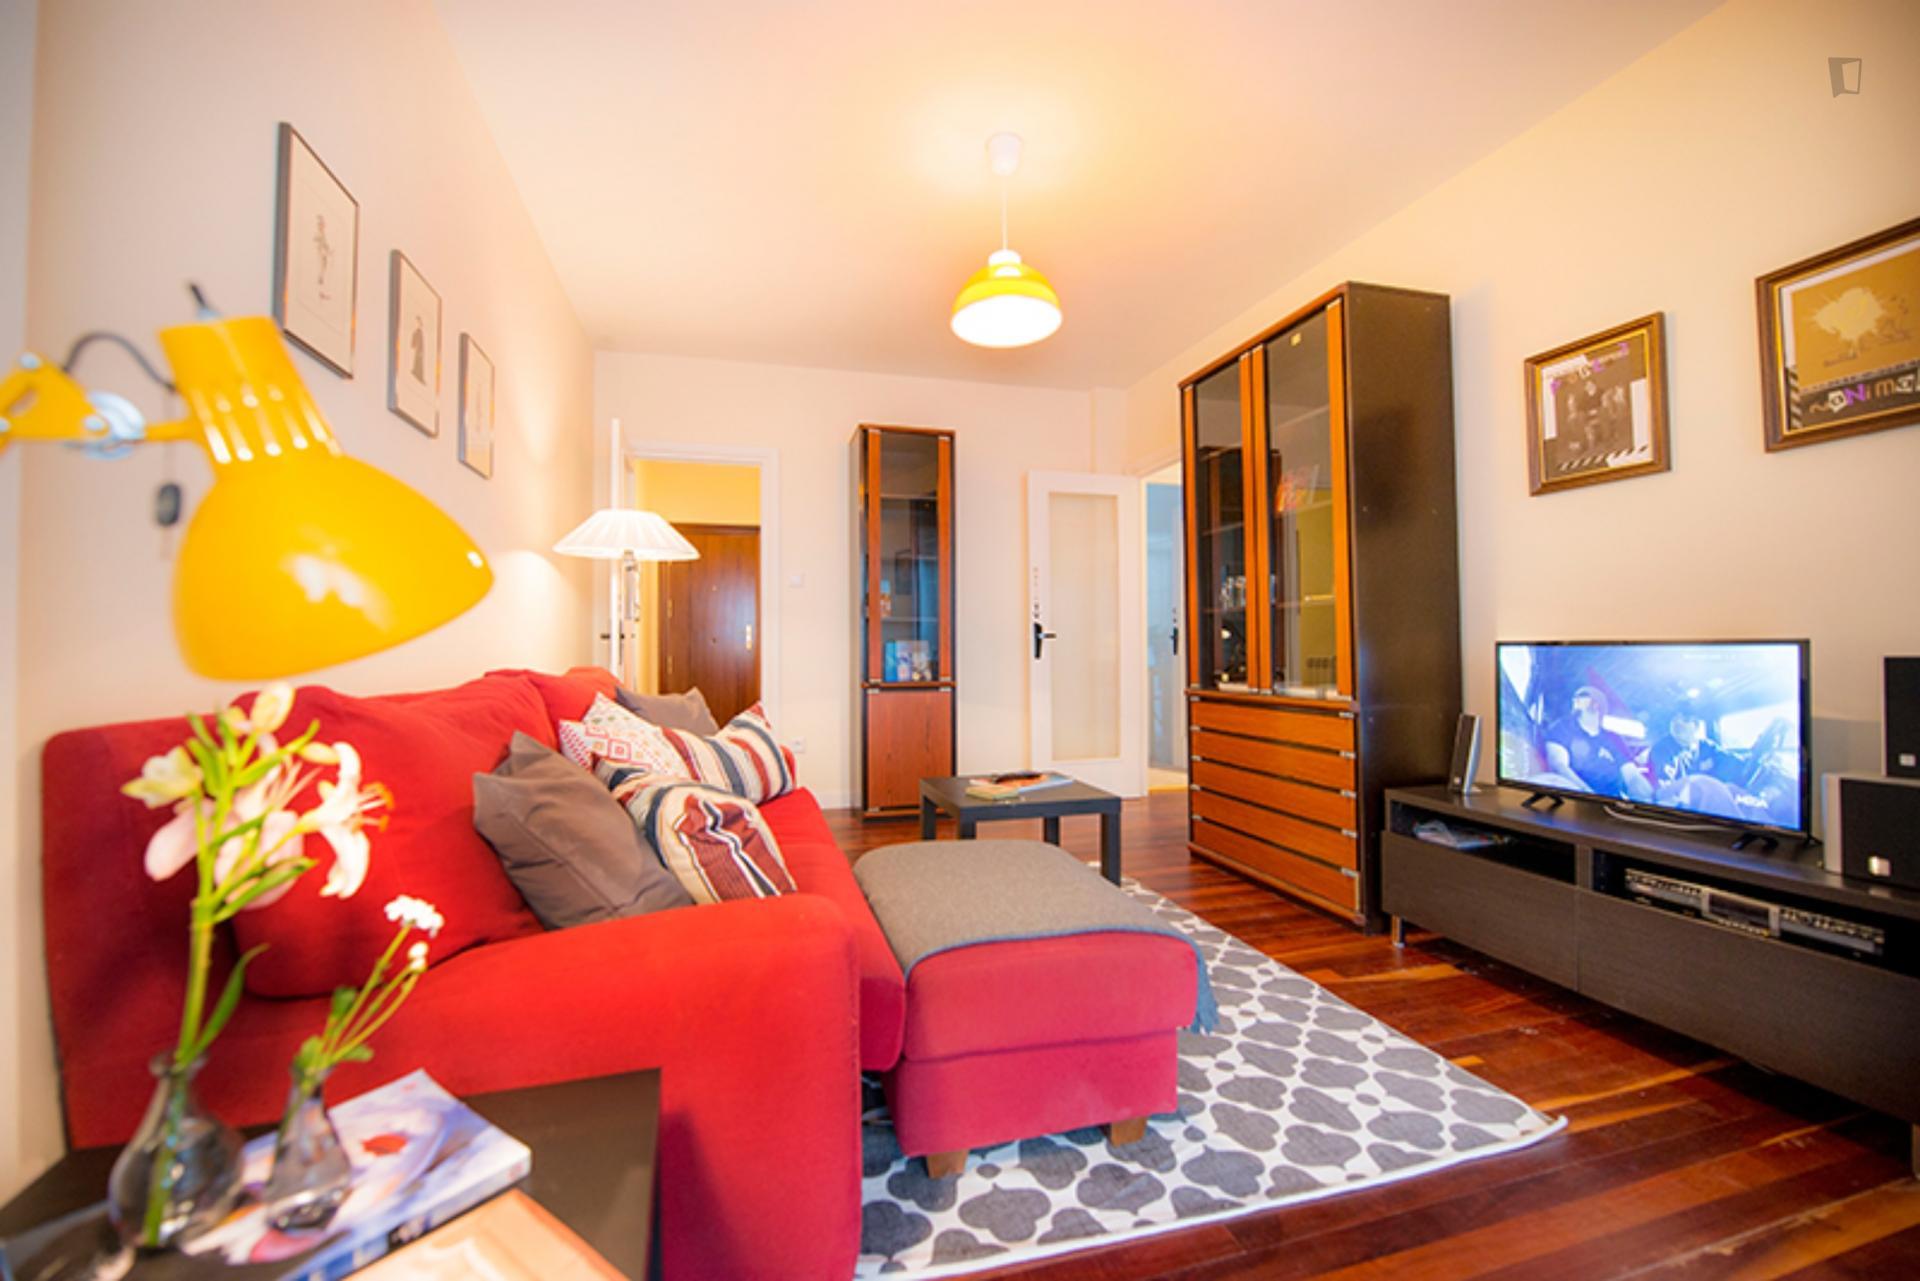 Kalea 16- Spacious Room in Shared Flat